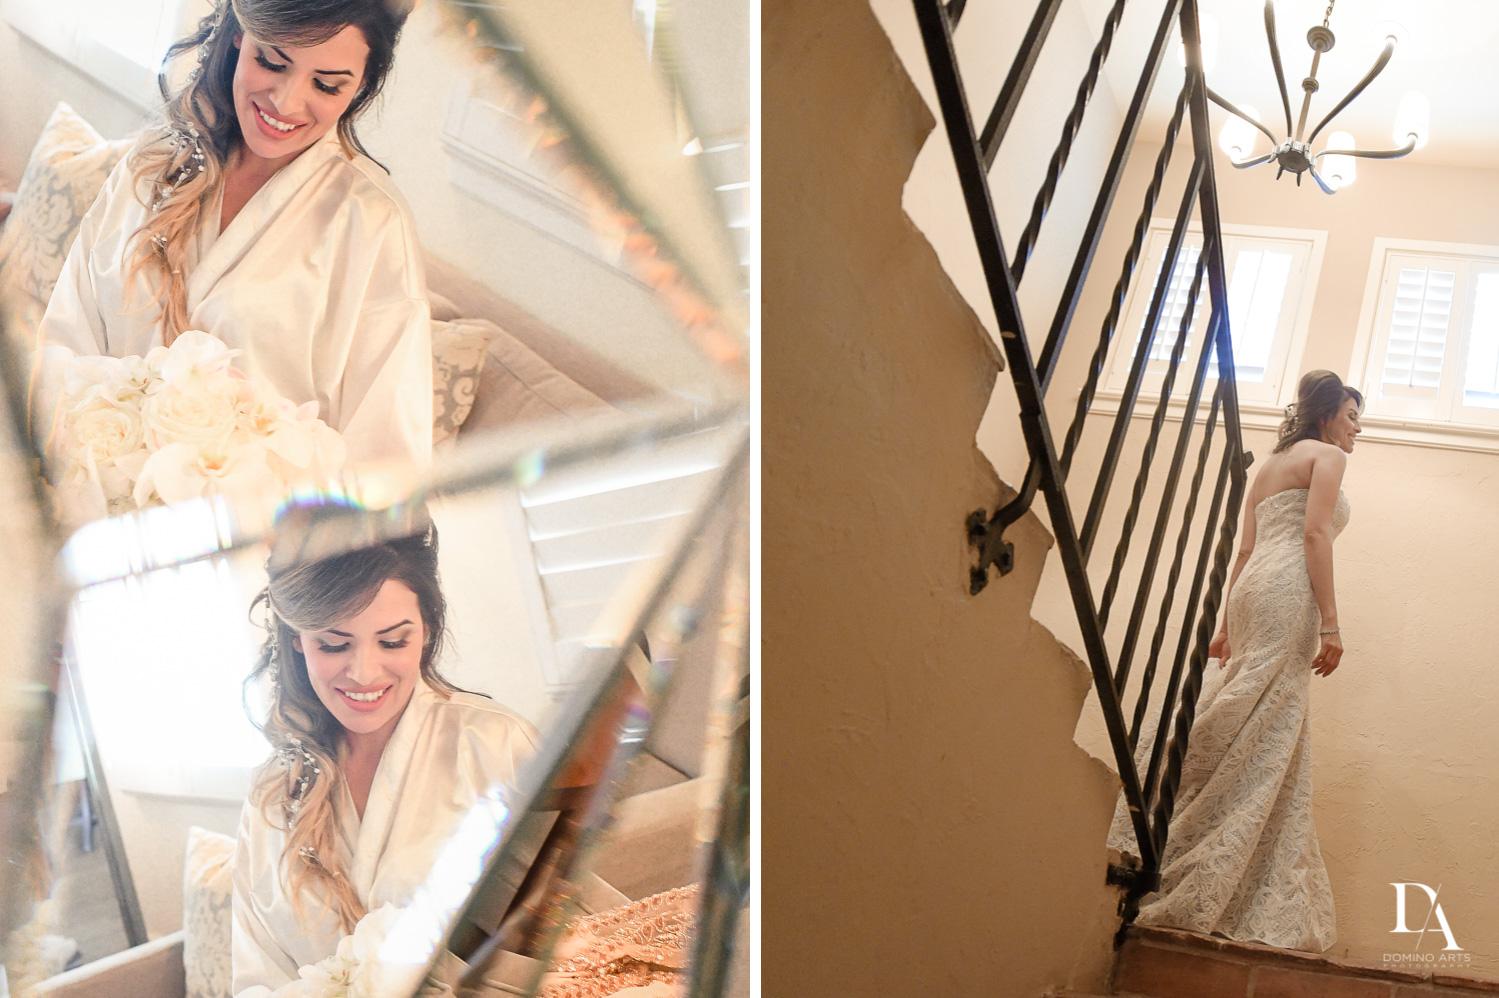 Bride getting ready picture at The Addison Boca Raton